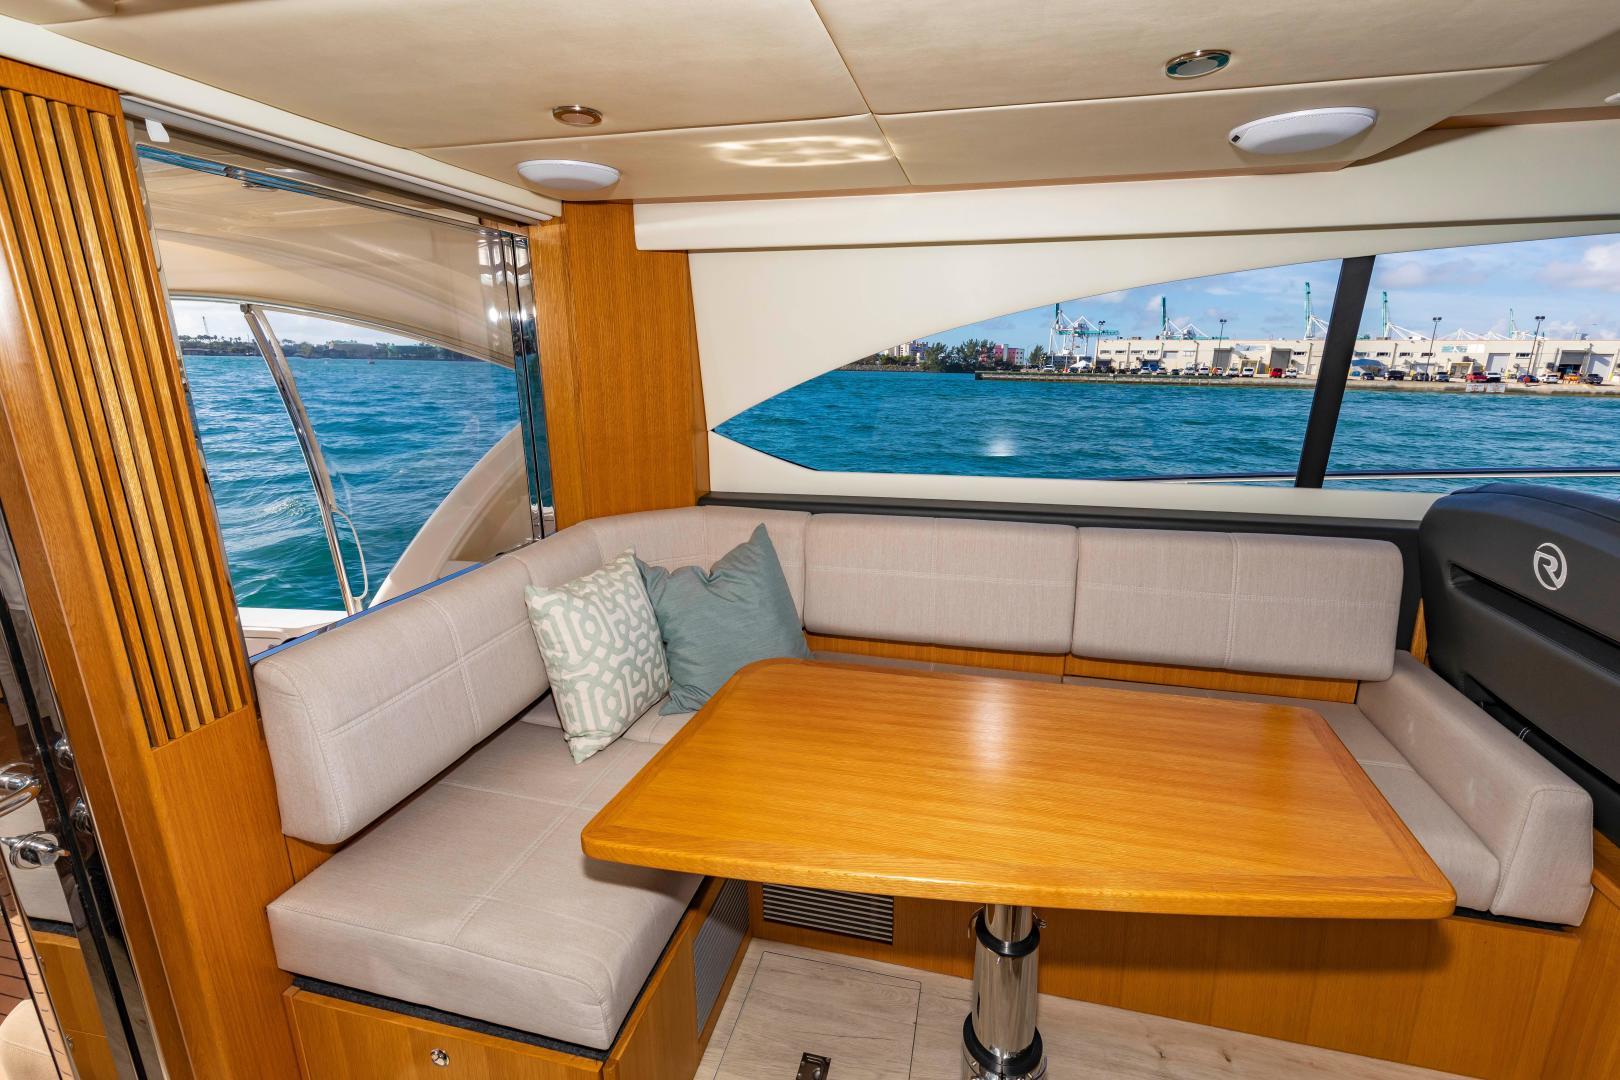 Riviera-395 SUV 2019-Ipanema Miami Beach-Florida-United States-1614898   Thumbnail